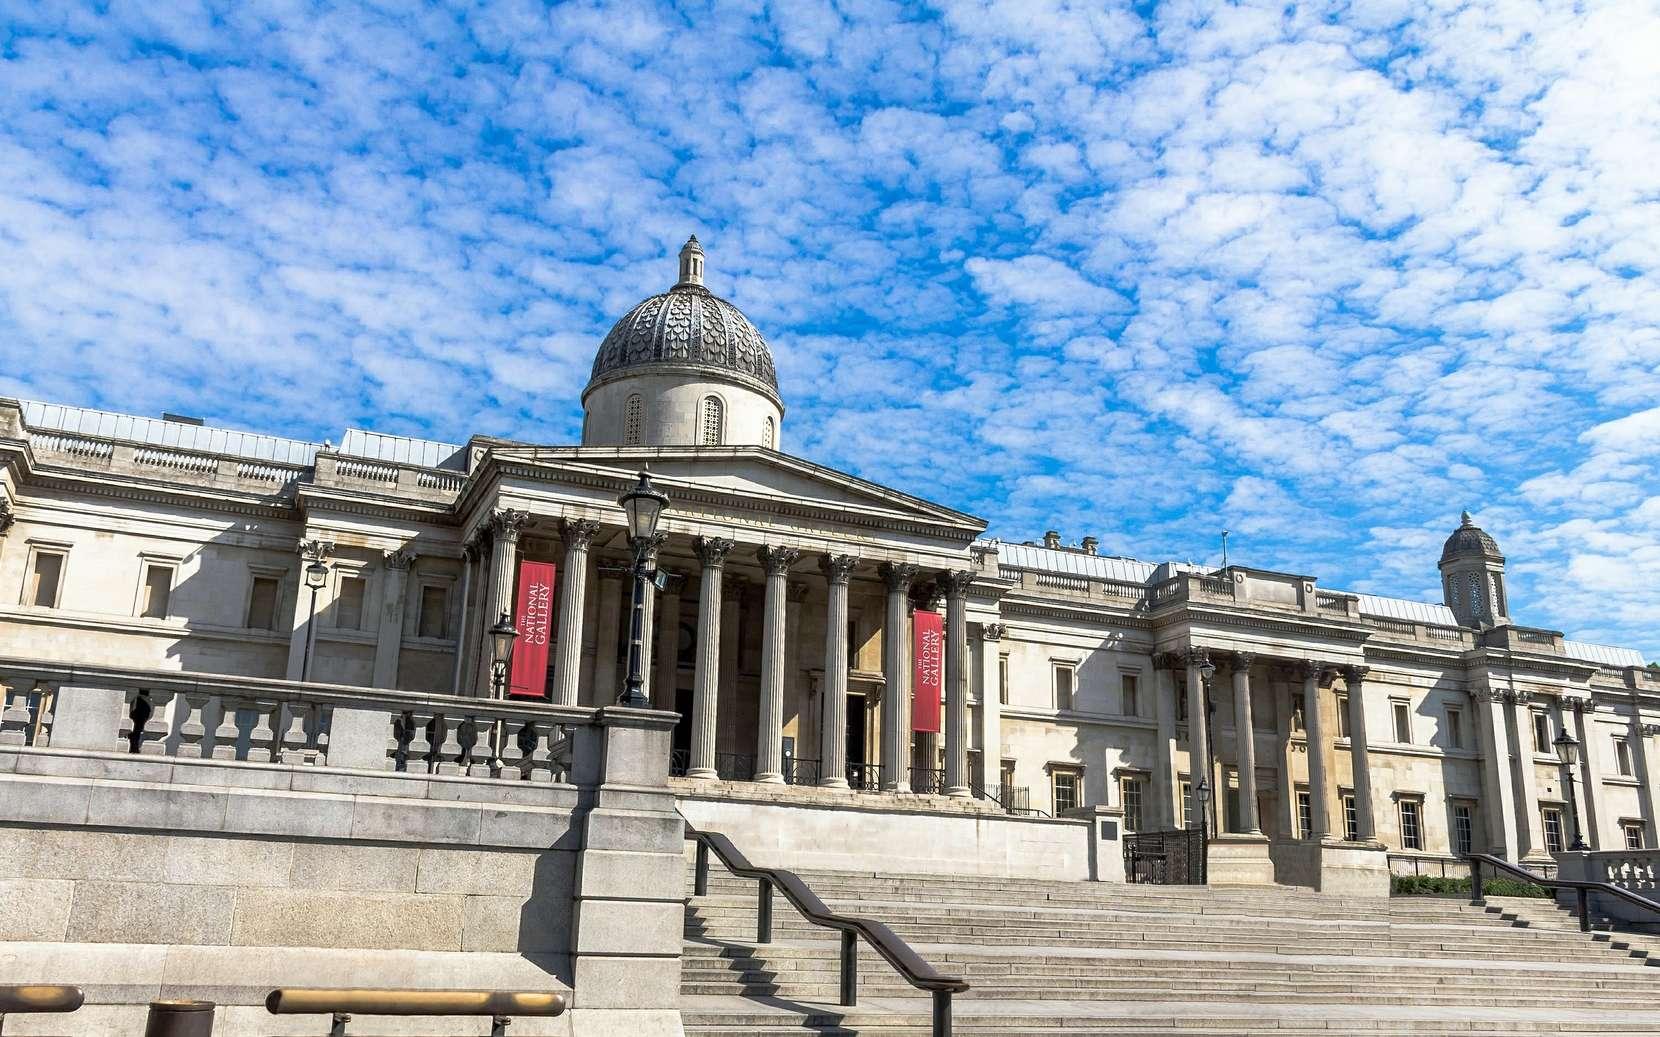 National Gallery de Londres. © Flick47, fotolia